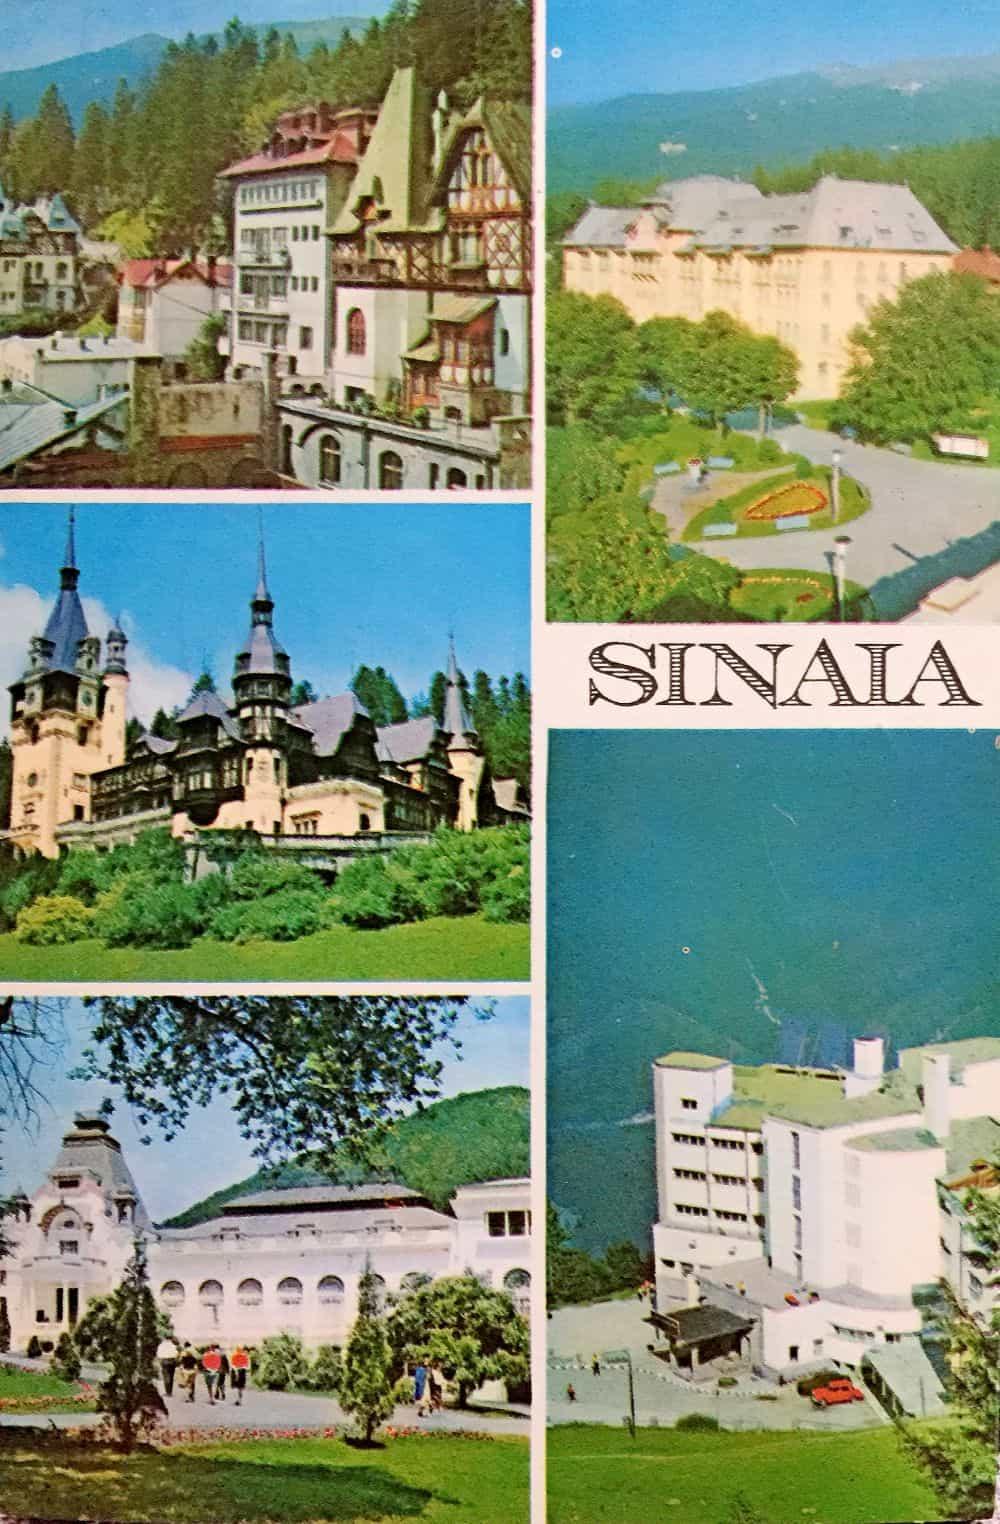 Sinaia 1975 ilustrate din Romania 13 ilustrate vechi din România Sinaia 1975